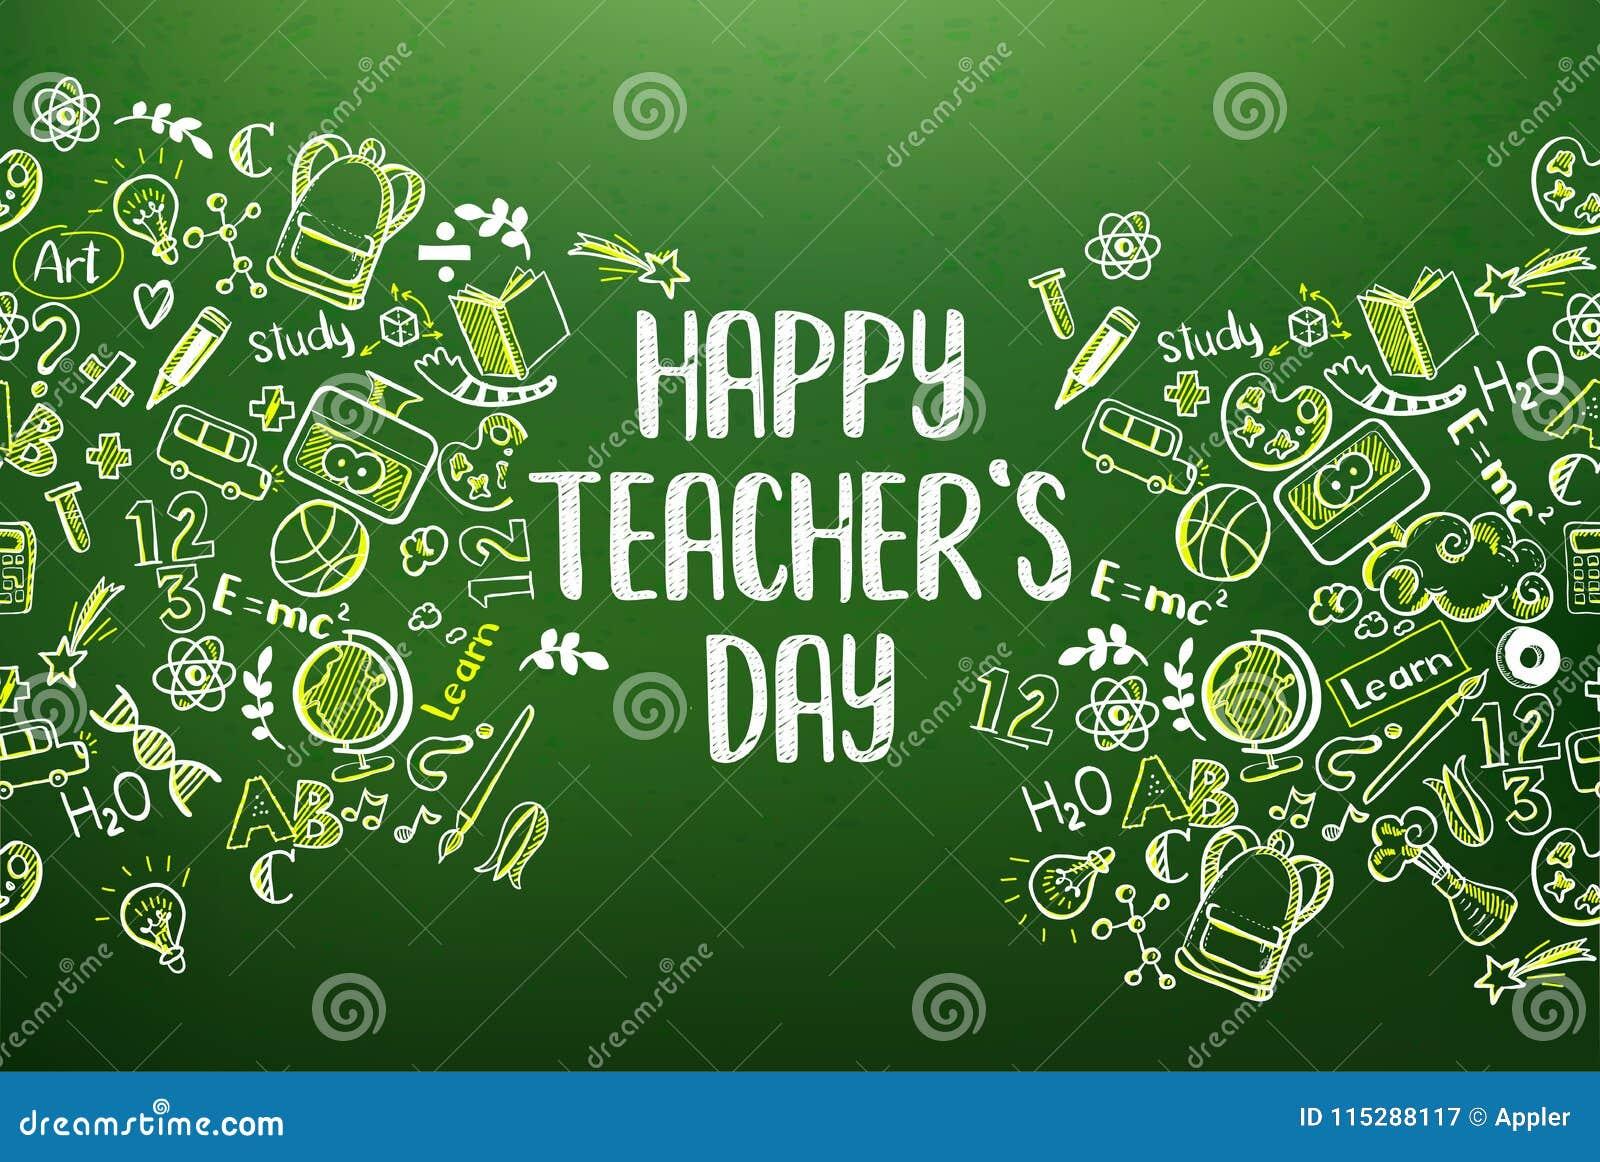 Chalkboard with happy teachers day